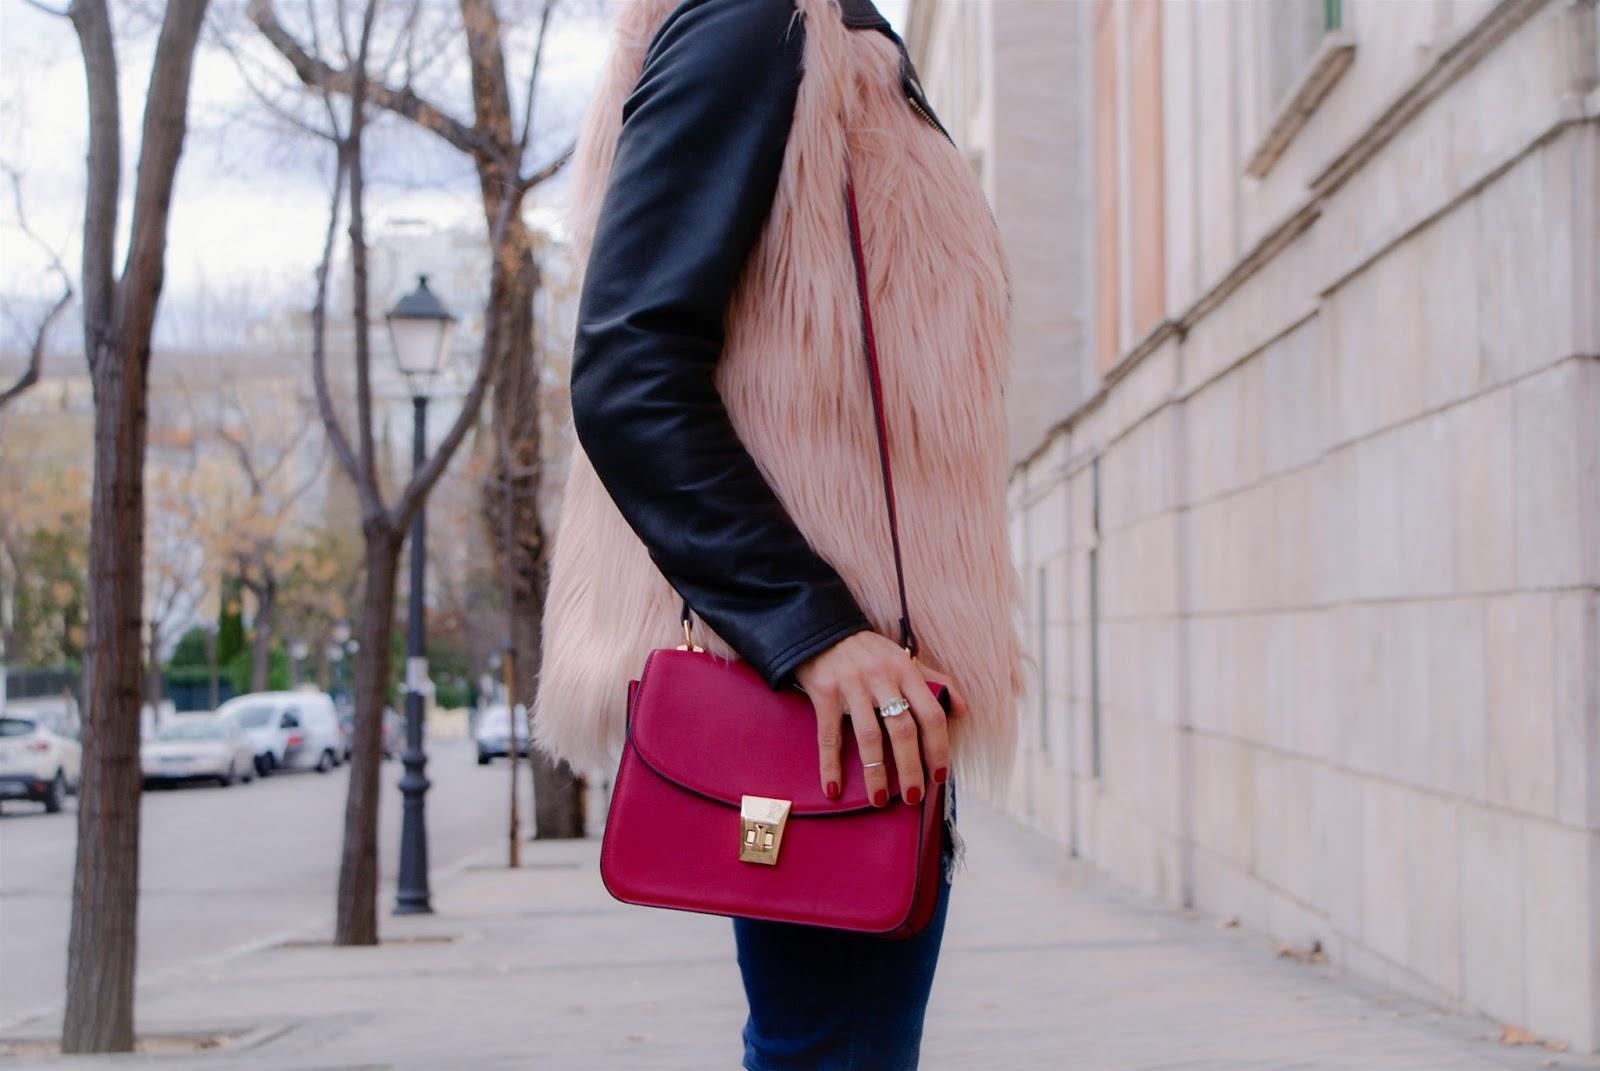 Belleza Moda Runner Mi Blog La Diario Caprichossa De 4vwp68q